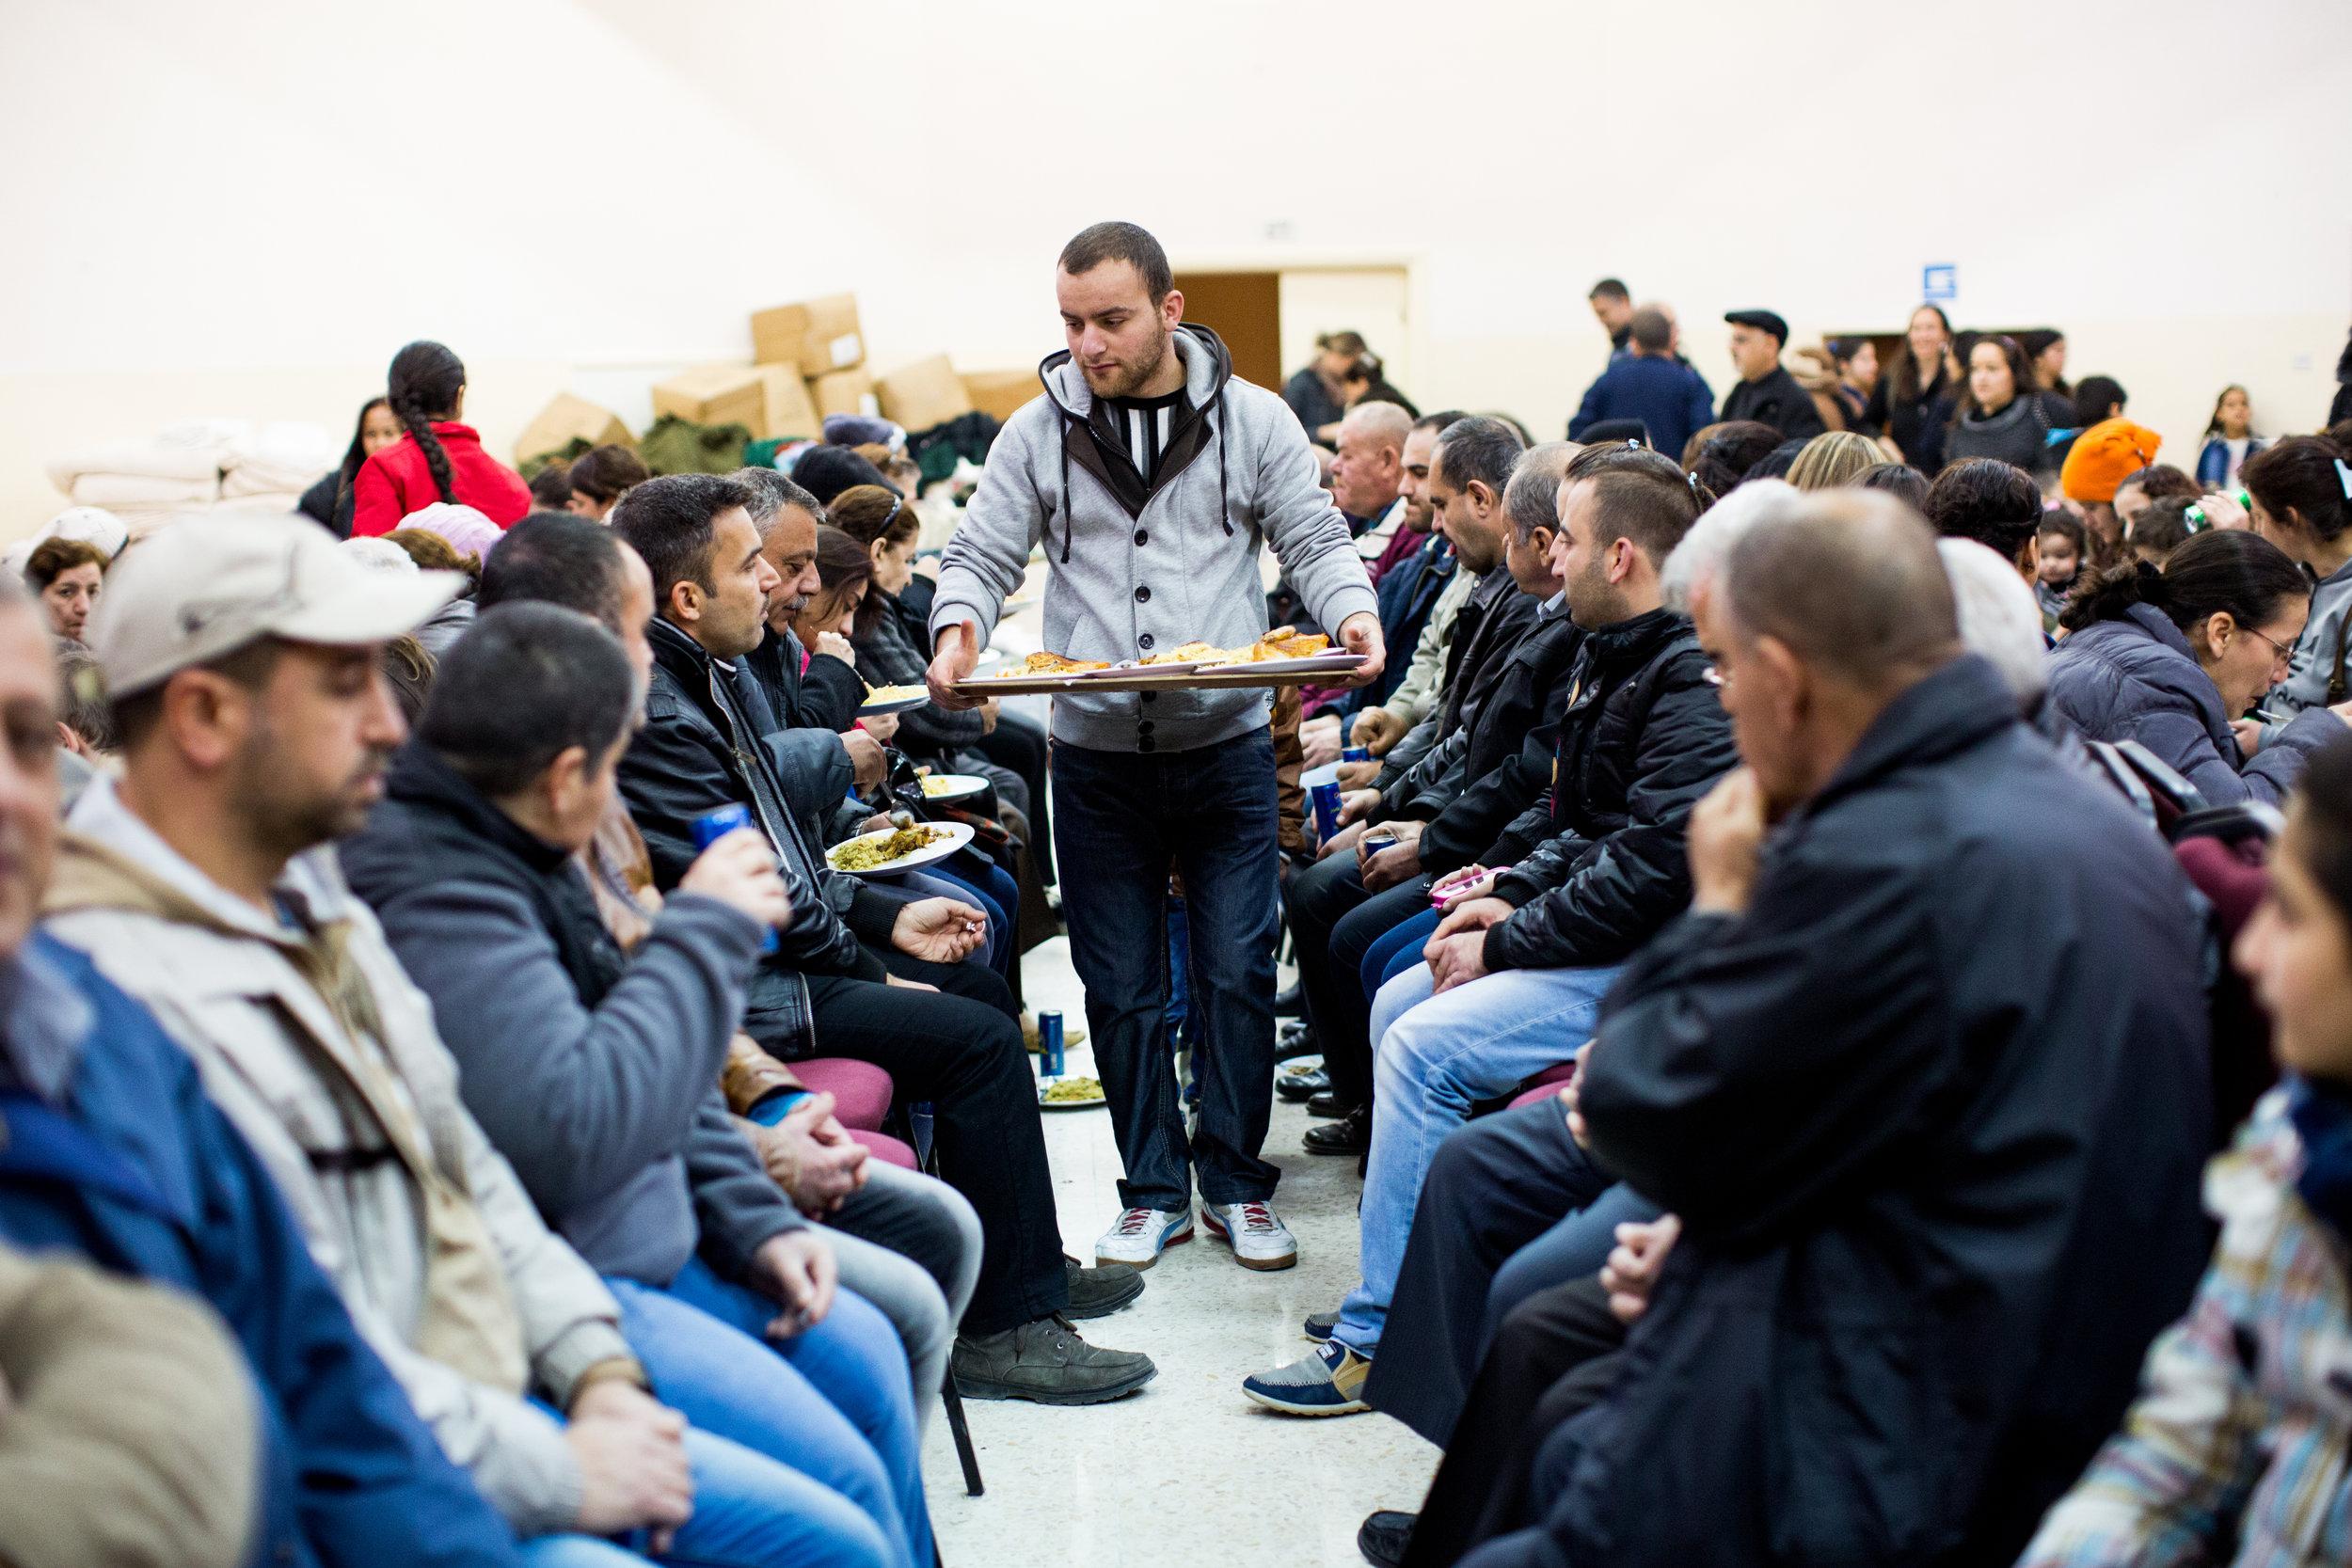 Iraqi Refugees_34.5850_29.0370_39.4189_33.4314_12287.jpg